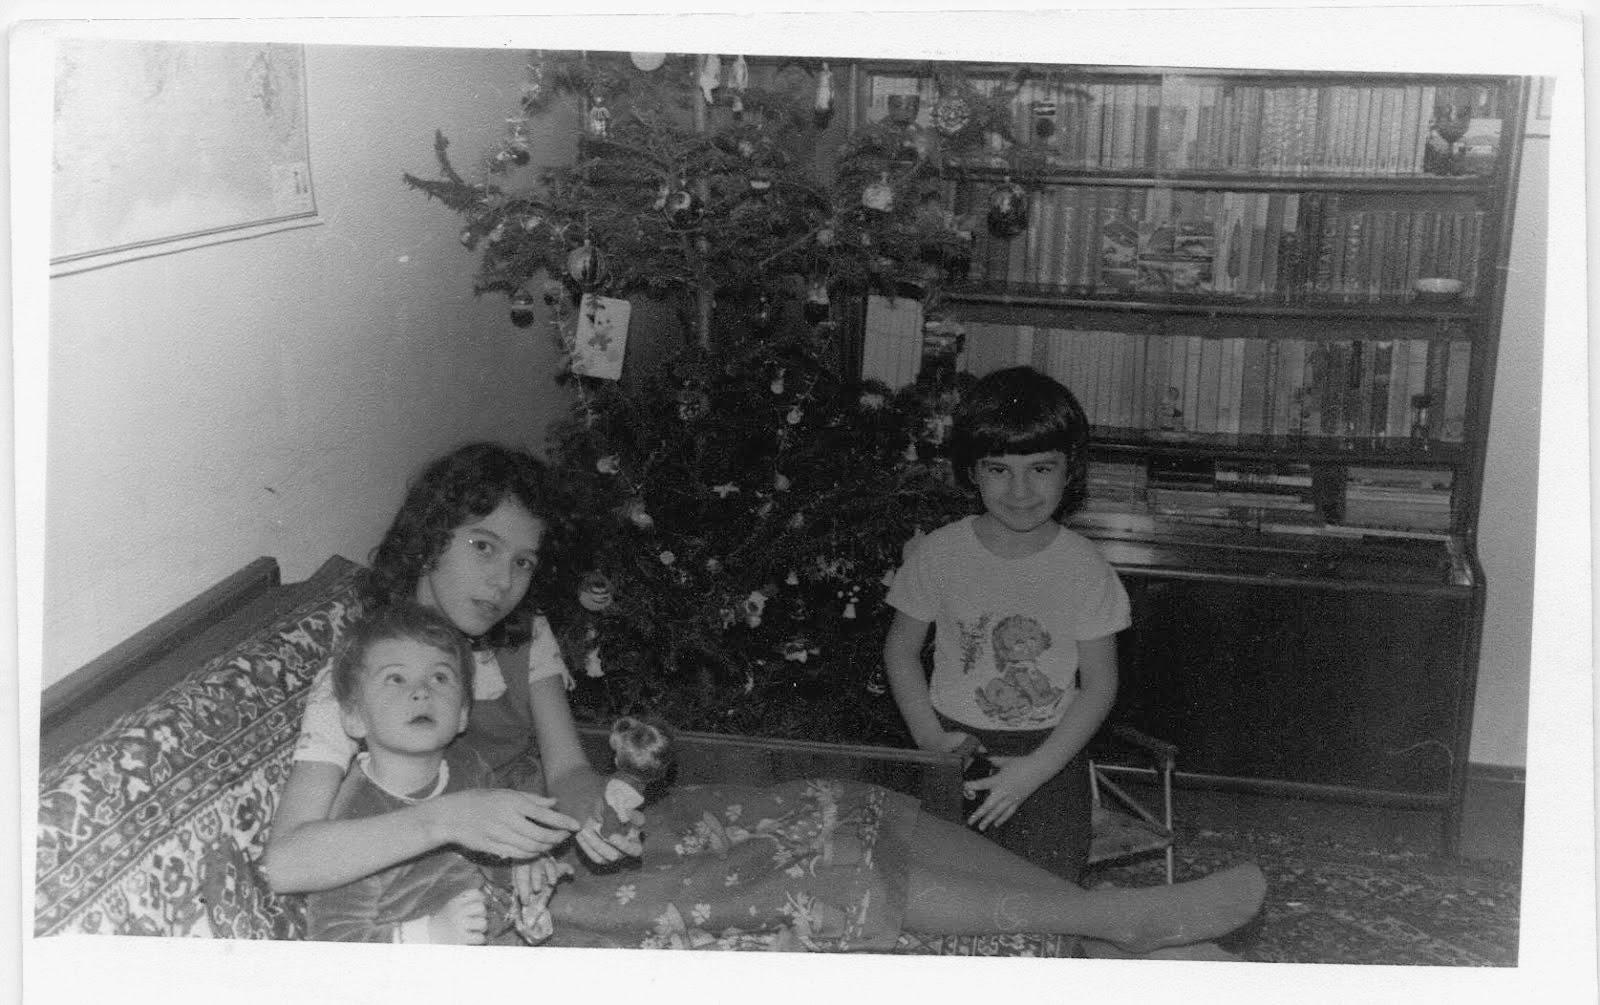 Olivia Maria Marcov Irina Craciunas Silviu Marcov January 1, 1983 Bucharest